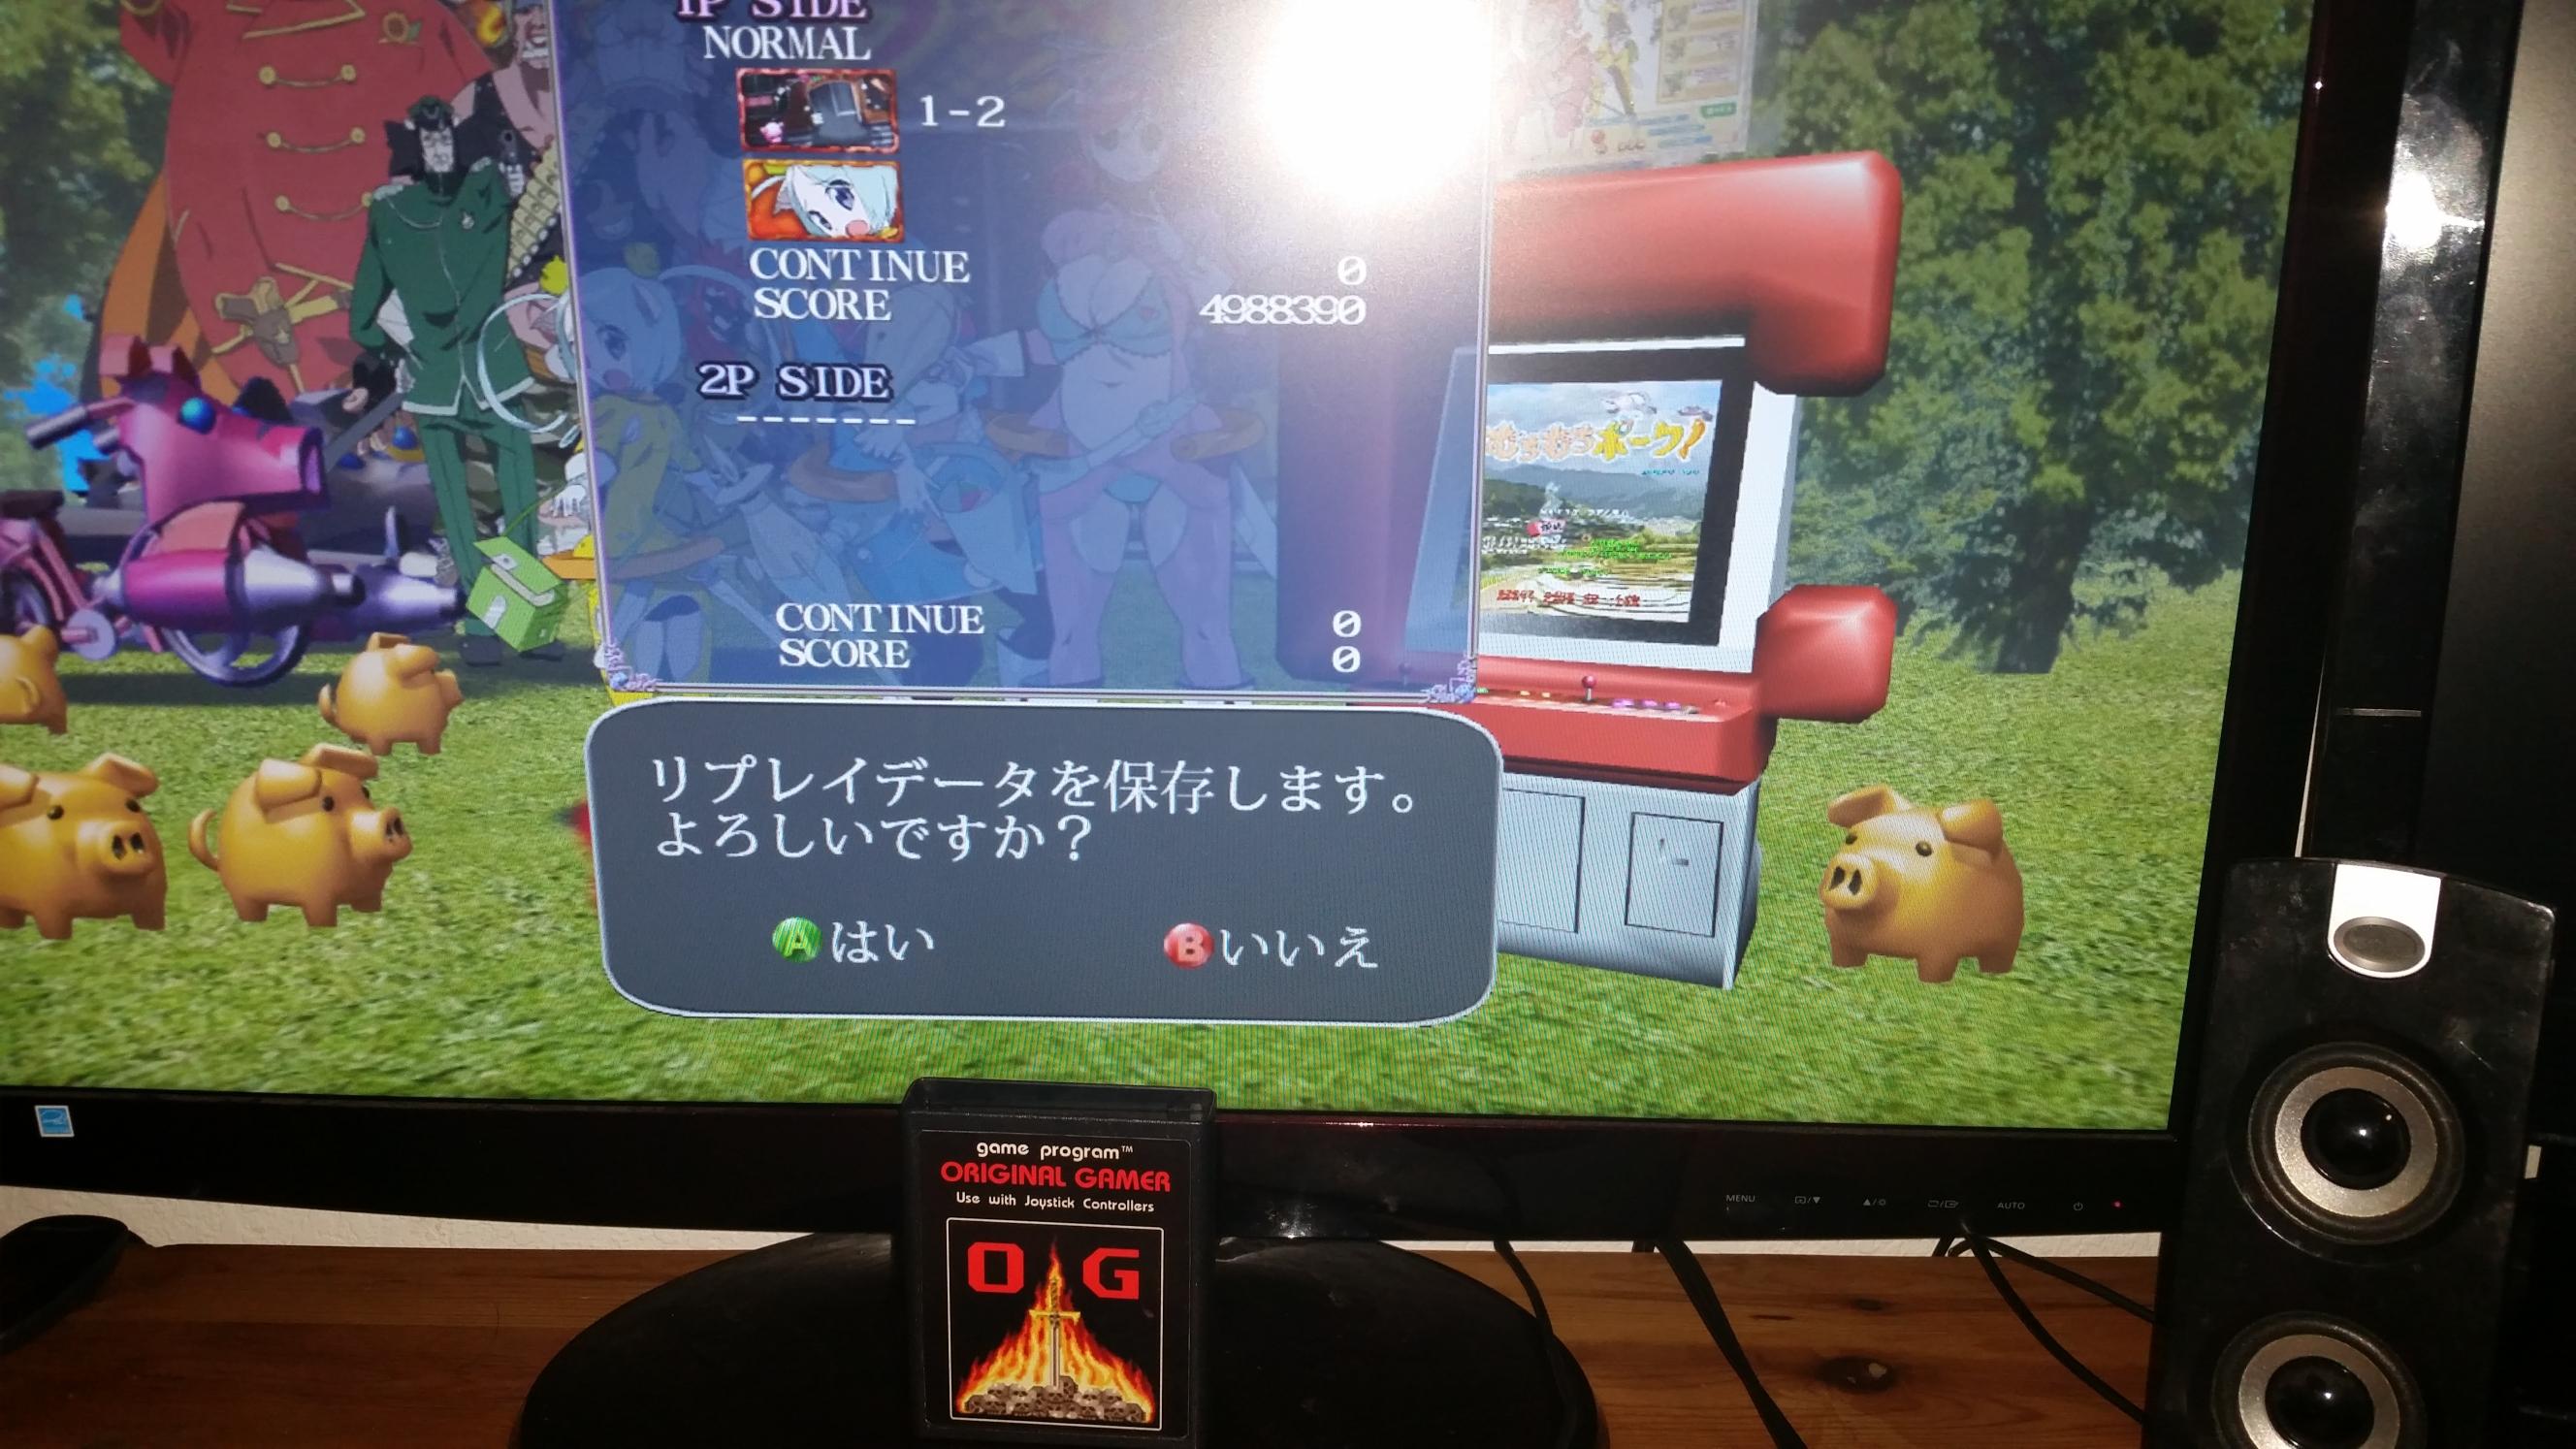 OriginalGamer: Muchi Muchi Pork [Arcade] (Xbox 360) 4,988,390 points on 2016-05-03 16:23:53